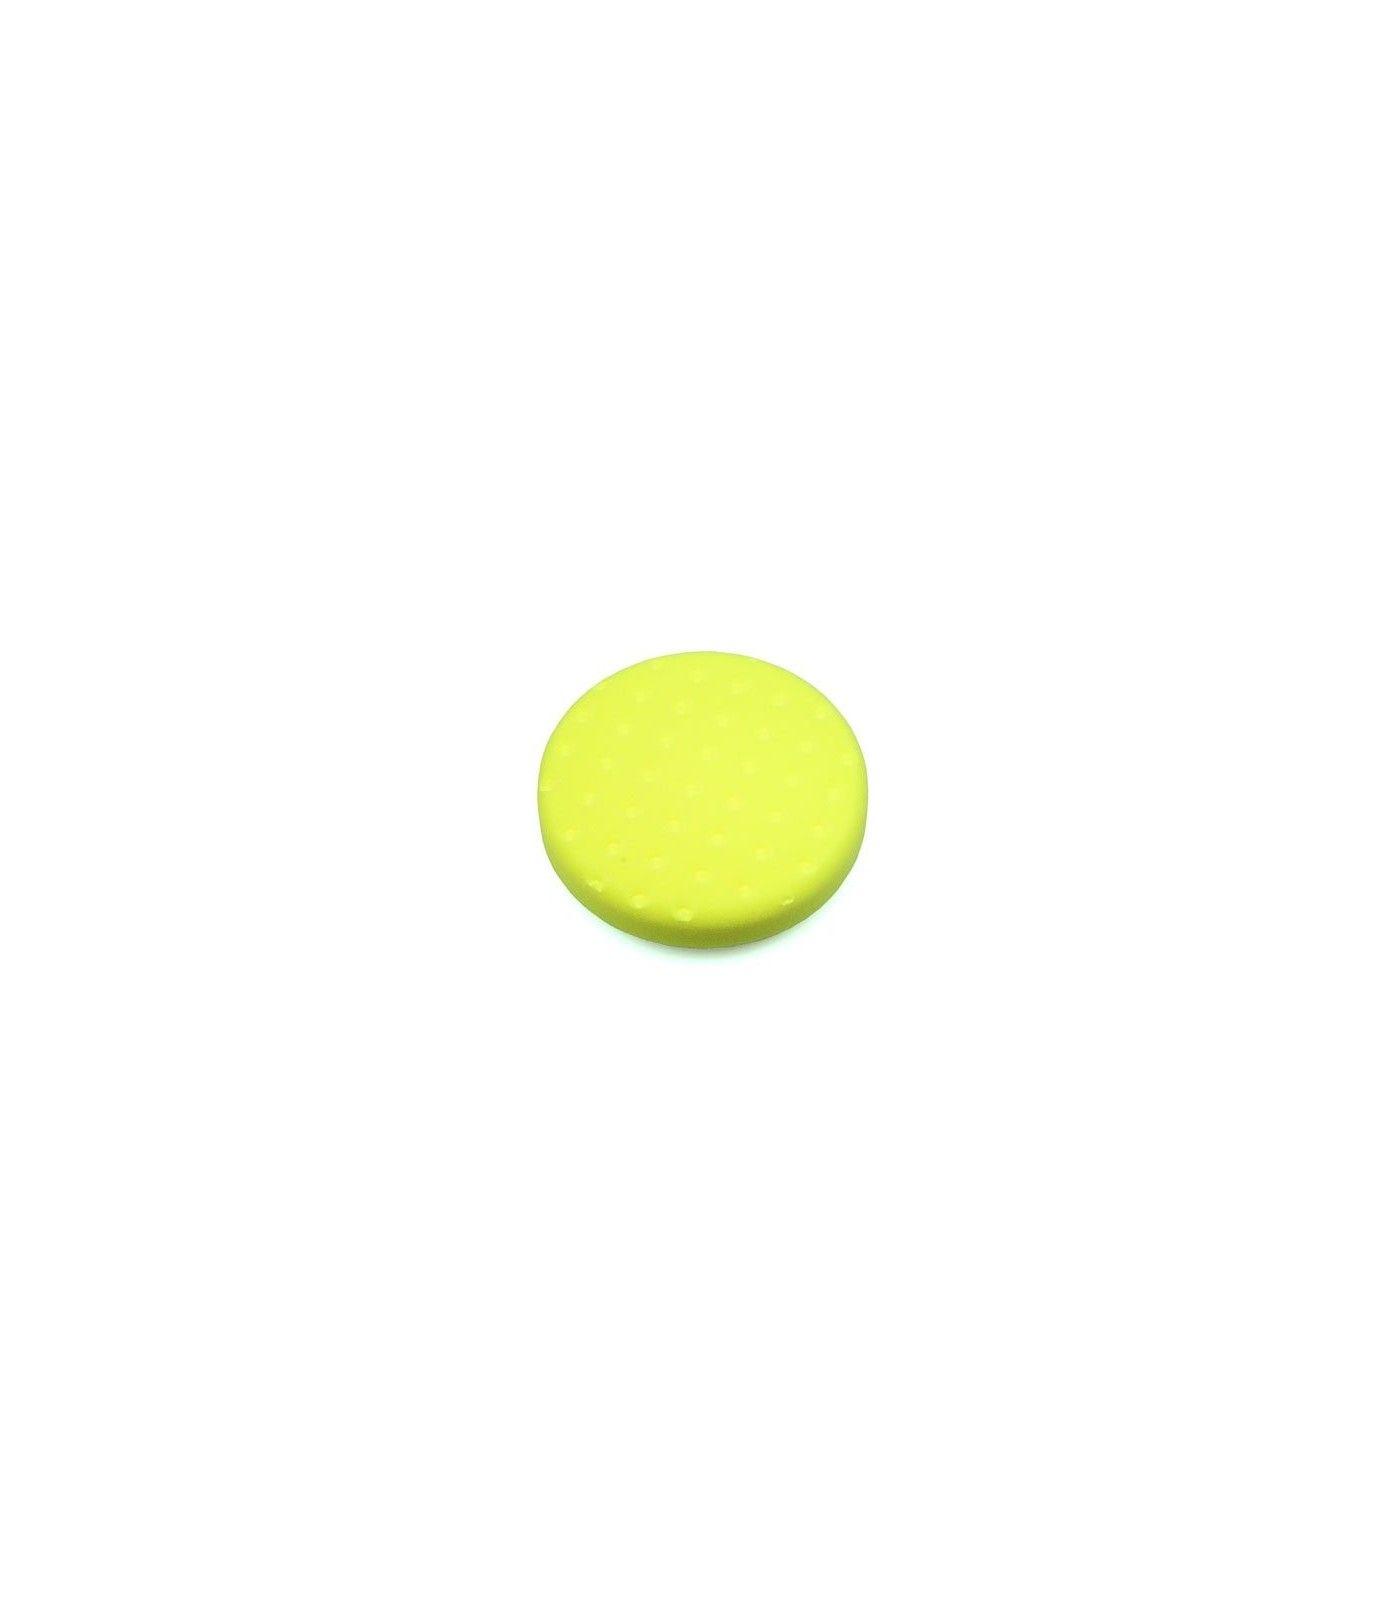 Lake Country - CCS Yellow Cutting Pad - 6.5''